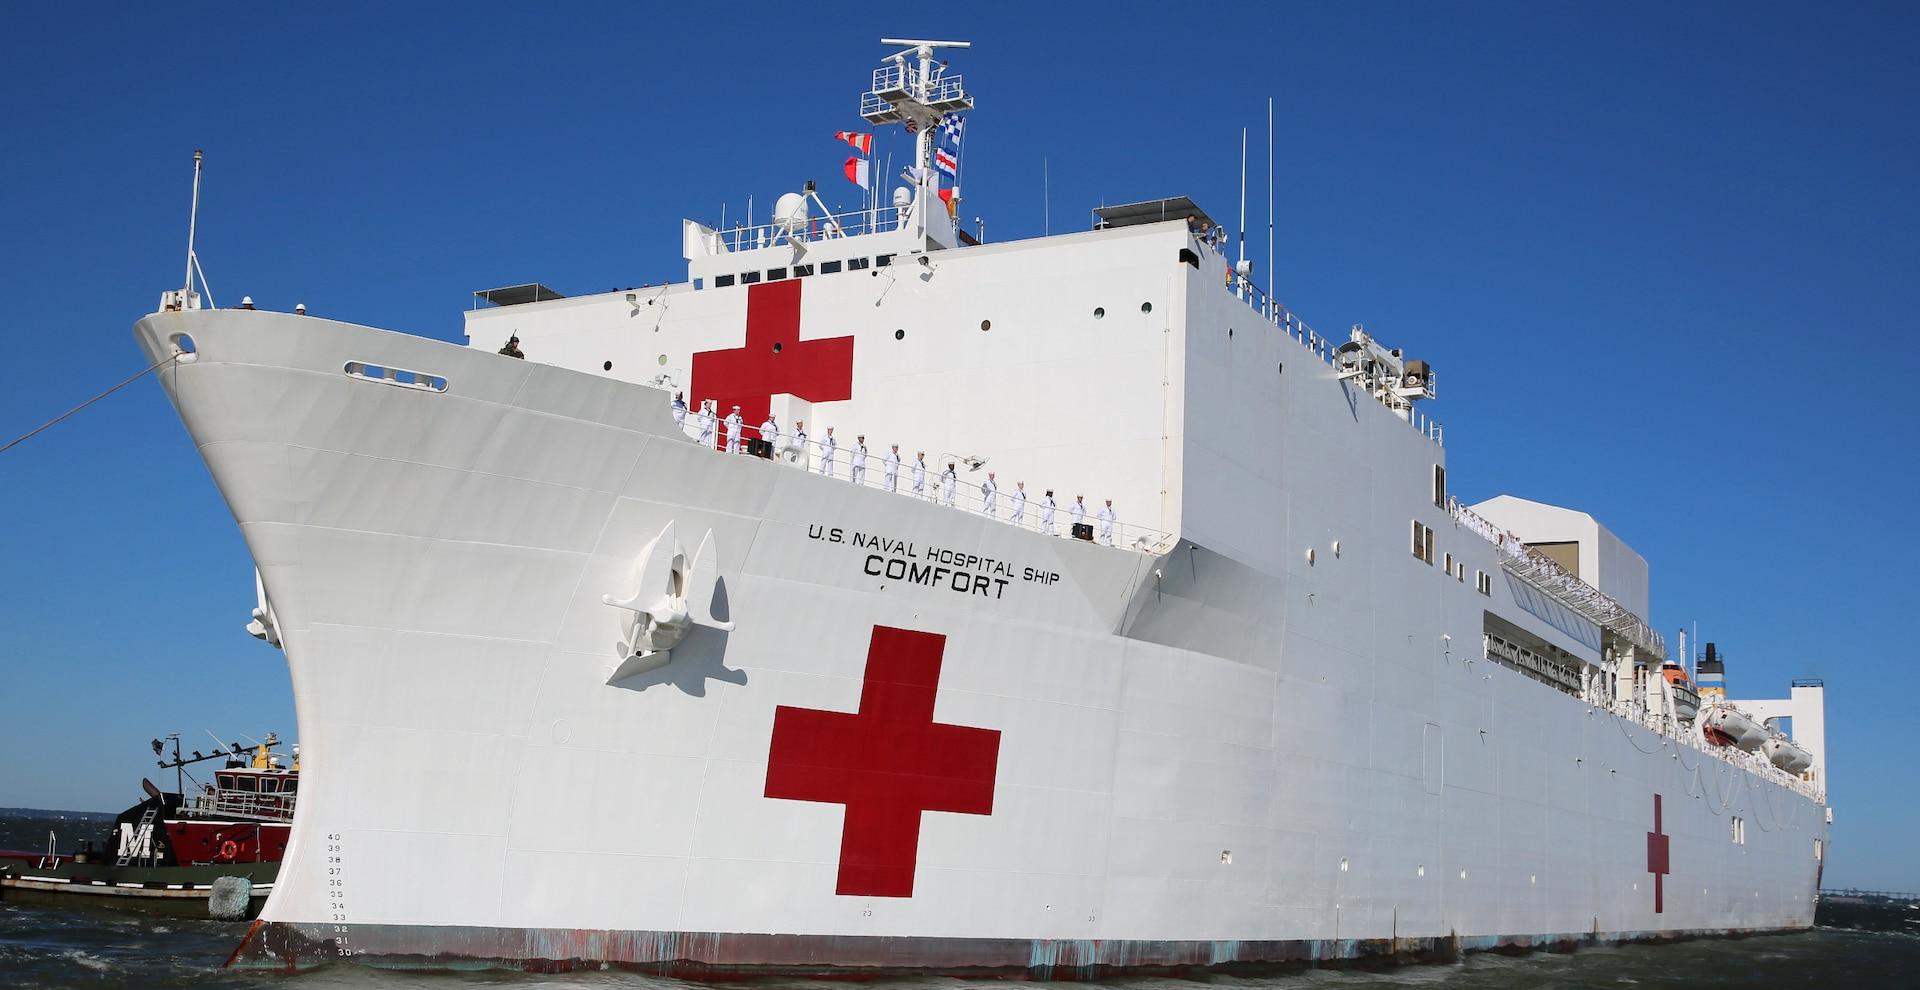 U.S. Navy Hospital Ship USNS Comfort (T-AH 20) gets underway from Naval Station Norfolk, June 14.